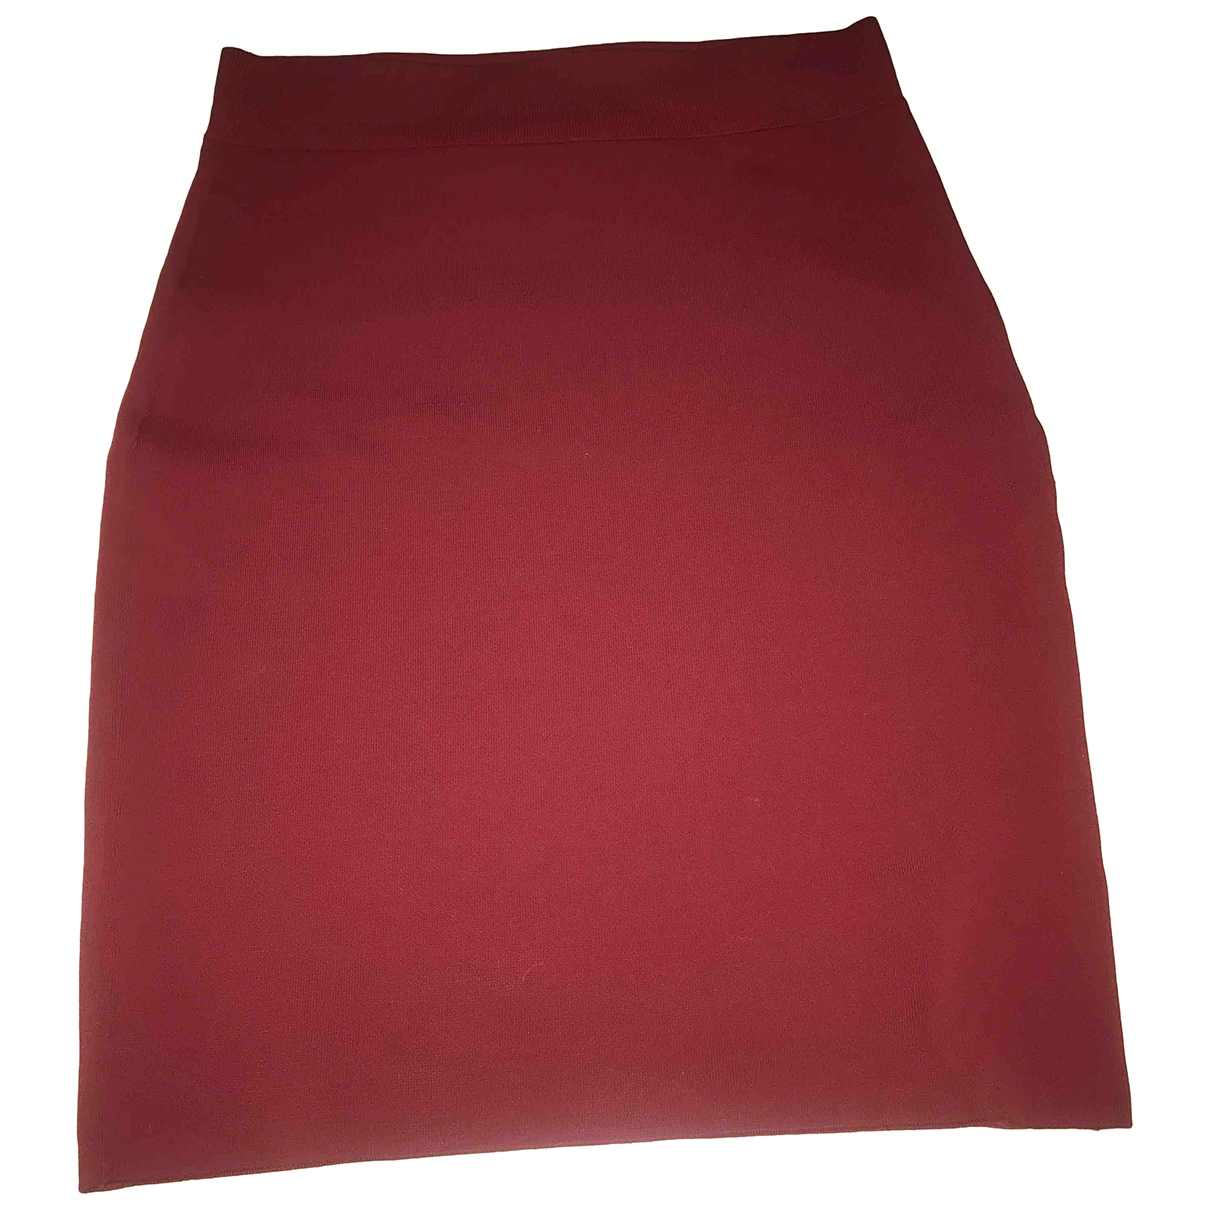 Barbara Bui \N Burgundy skirt for Women S International